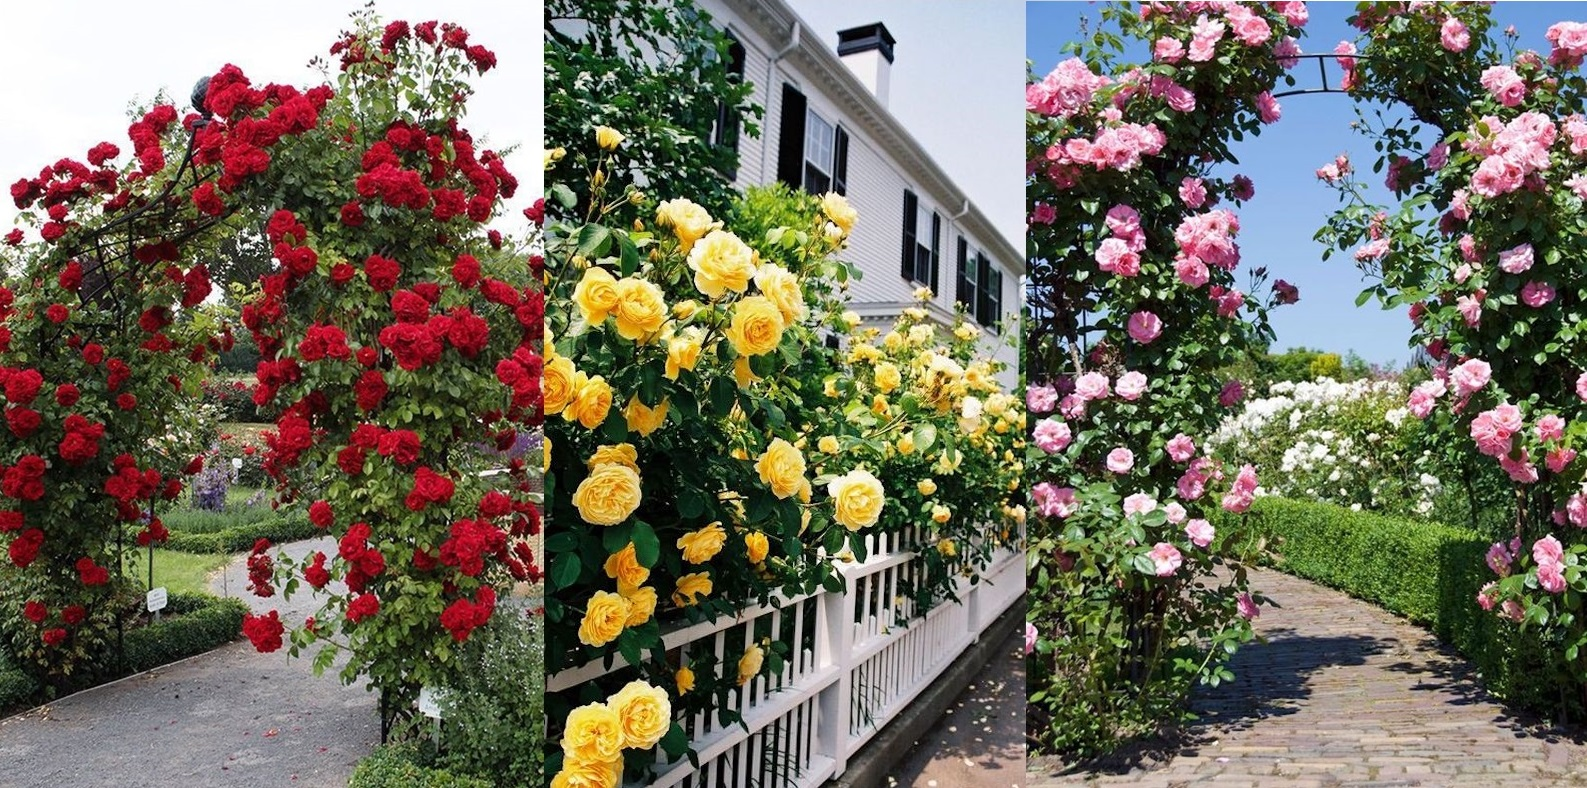 Cum sa ai tufe bogate de trandafiri spectaculosi in curtea casei tale. Ingrijirea trandafirilor cataratori. GALERIE FOTO!